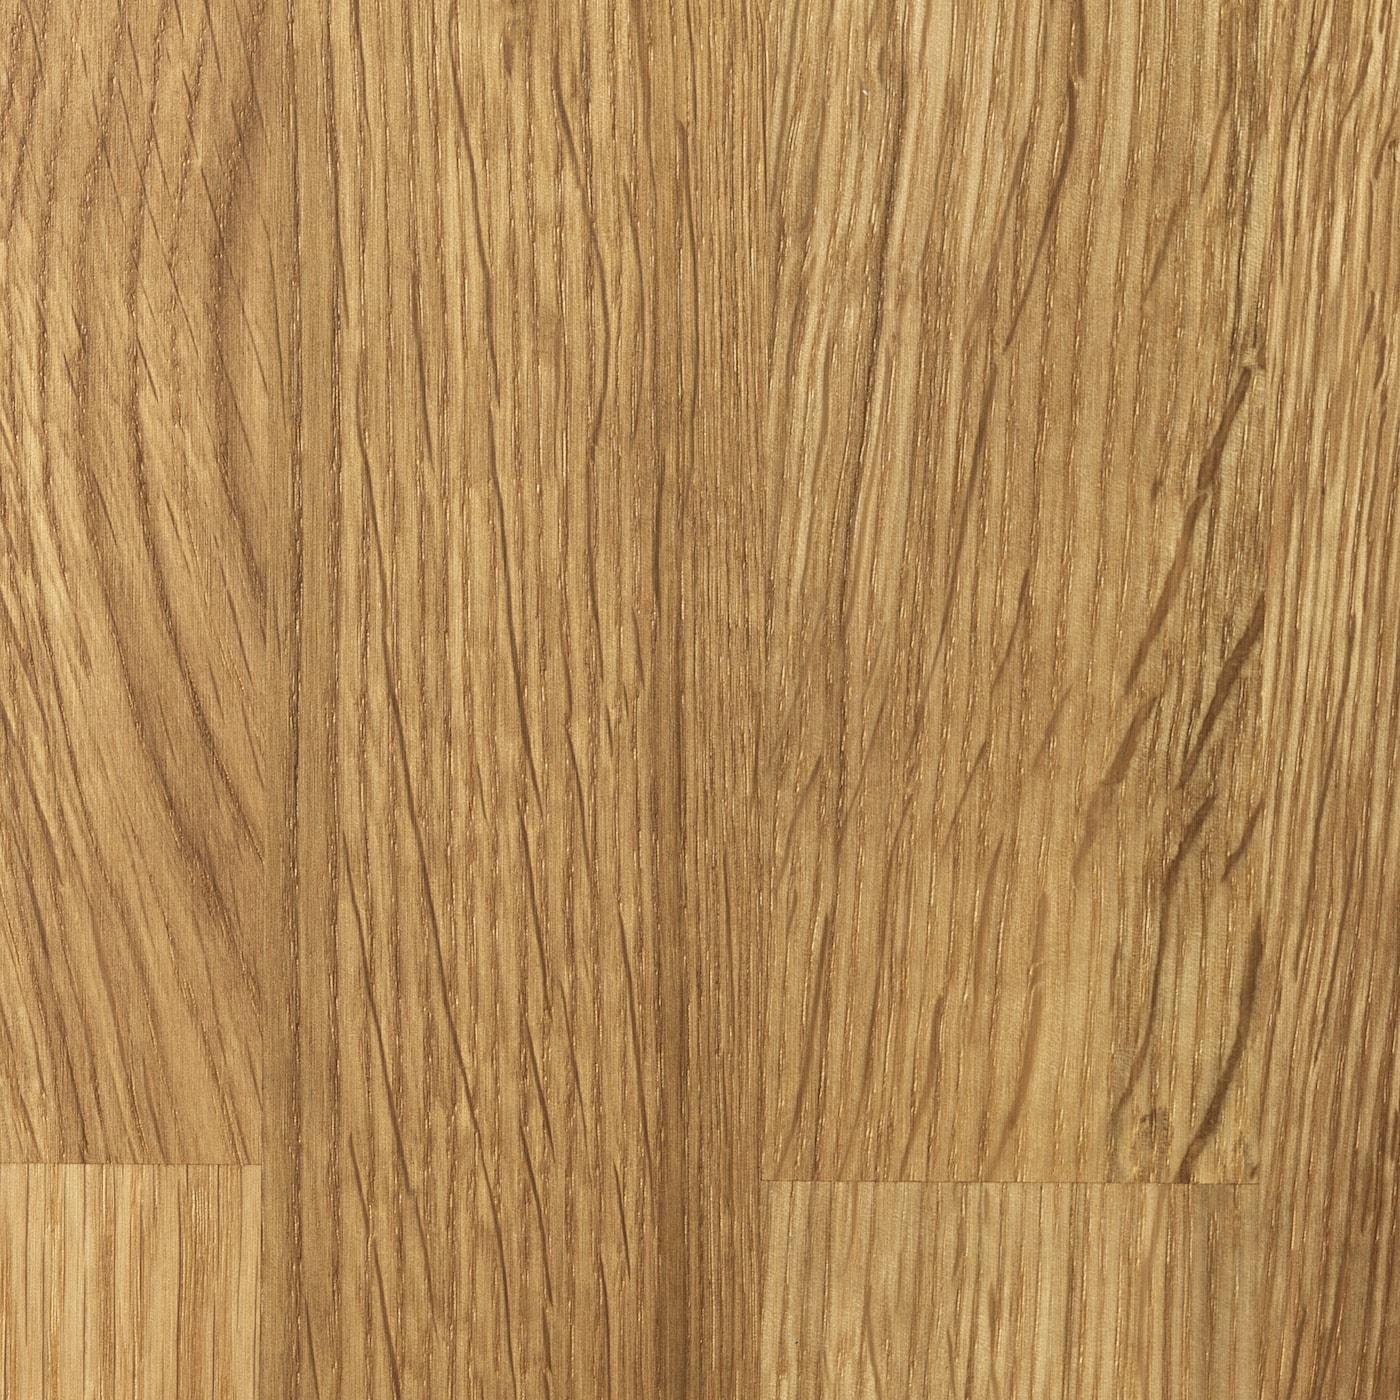 KARLBY Plan de travail, chêne, plaqué, 246x3 IKEA